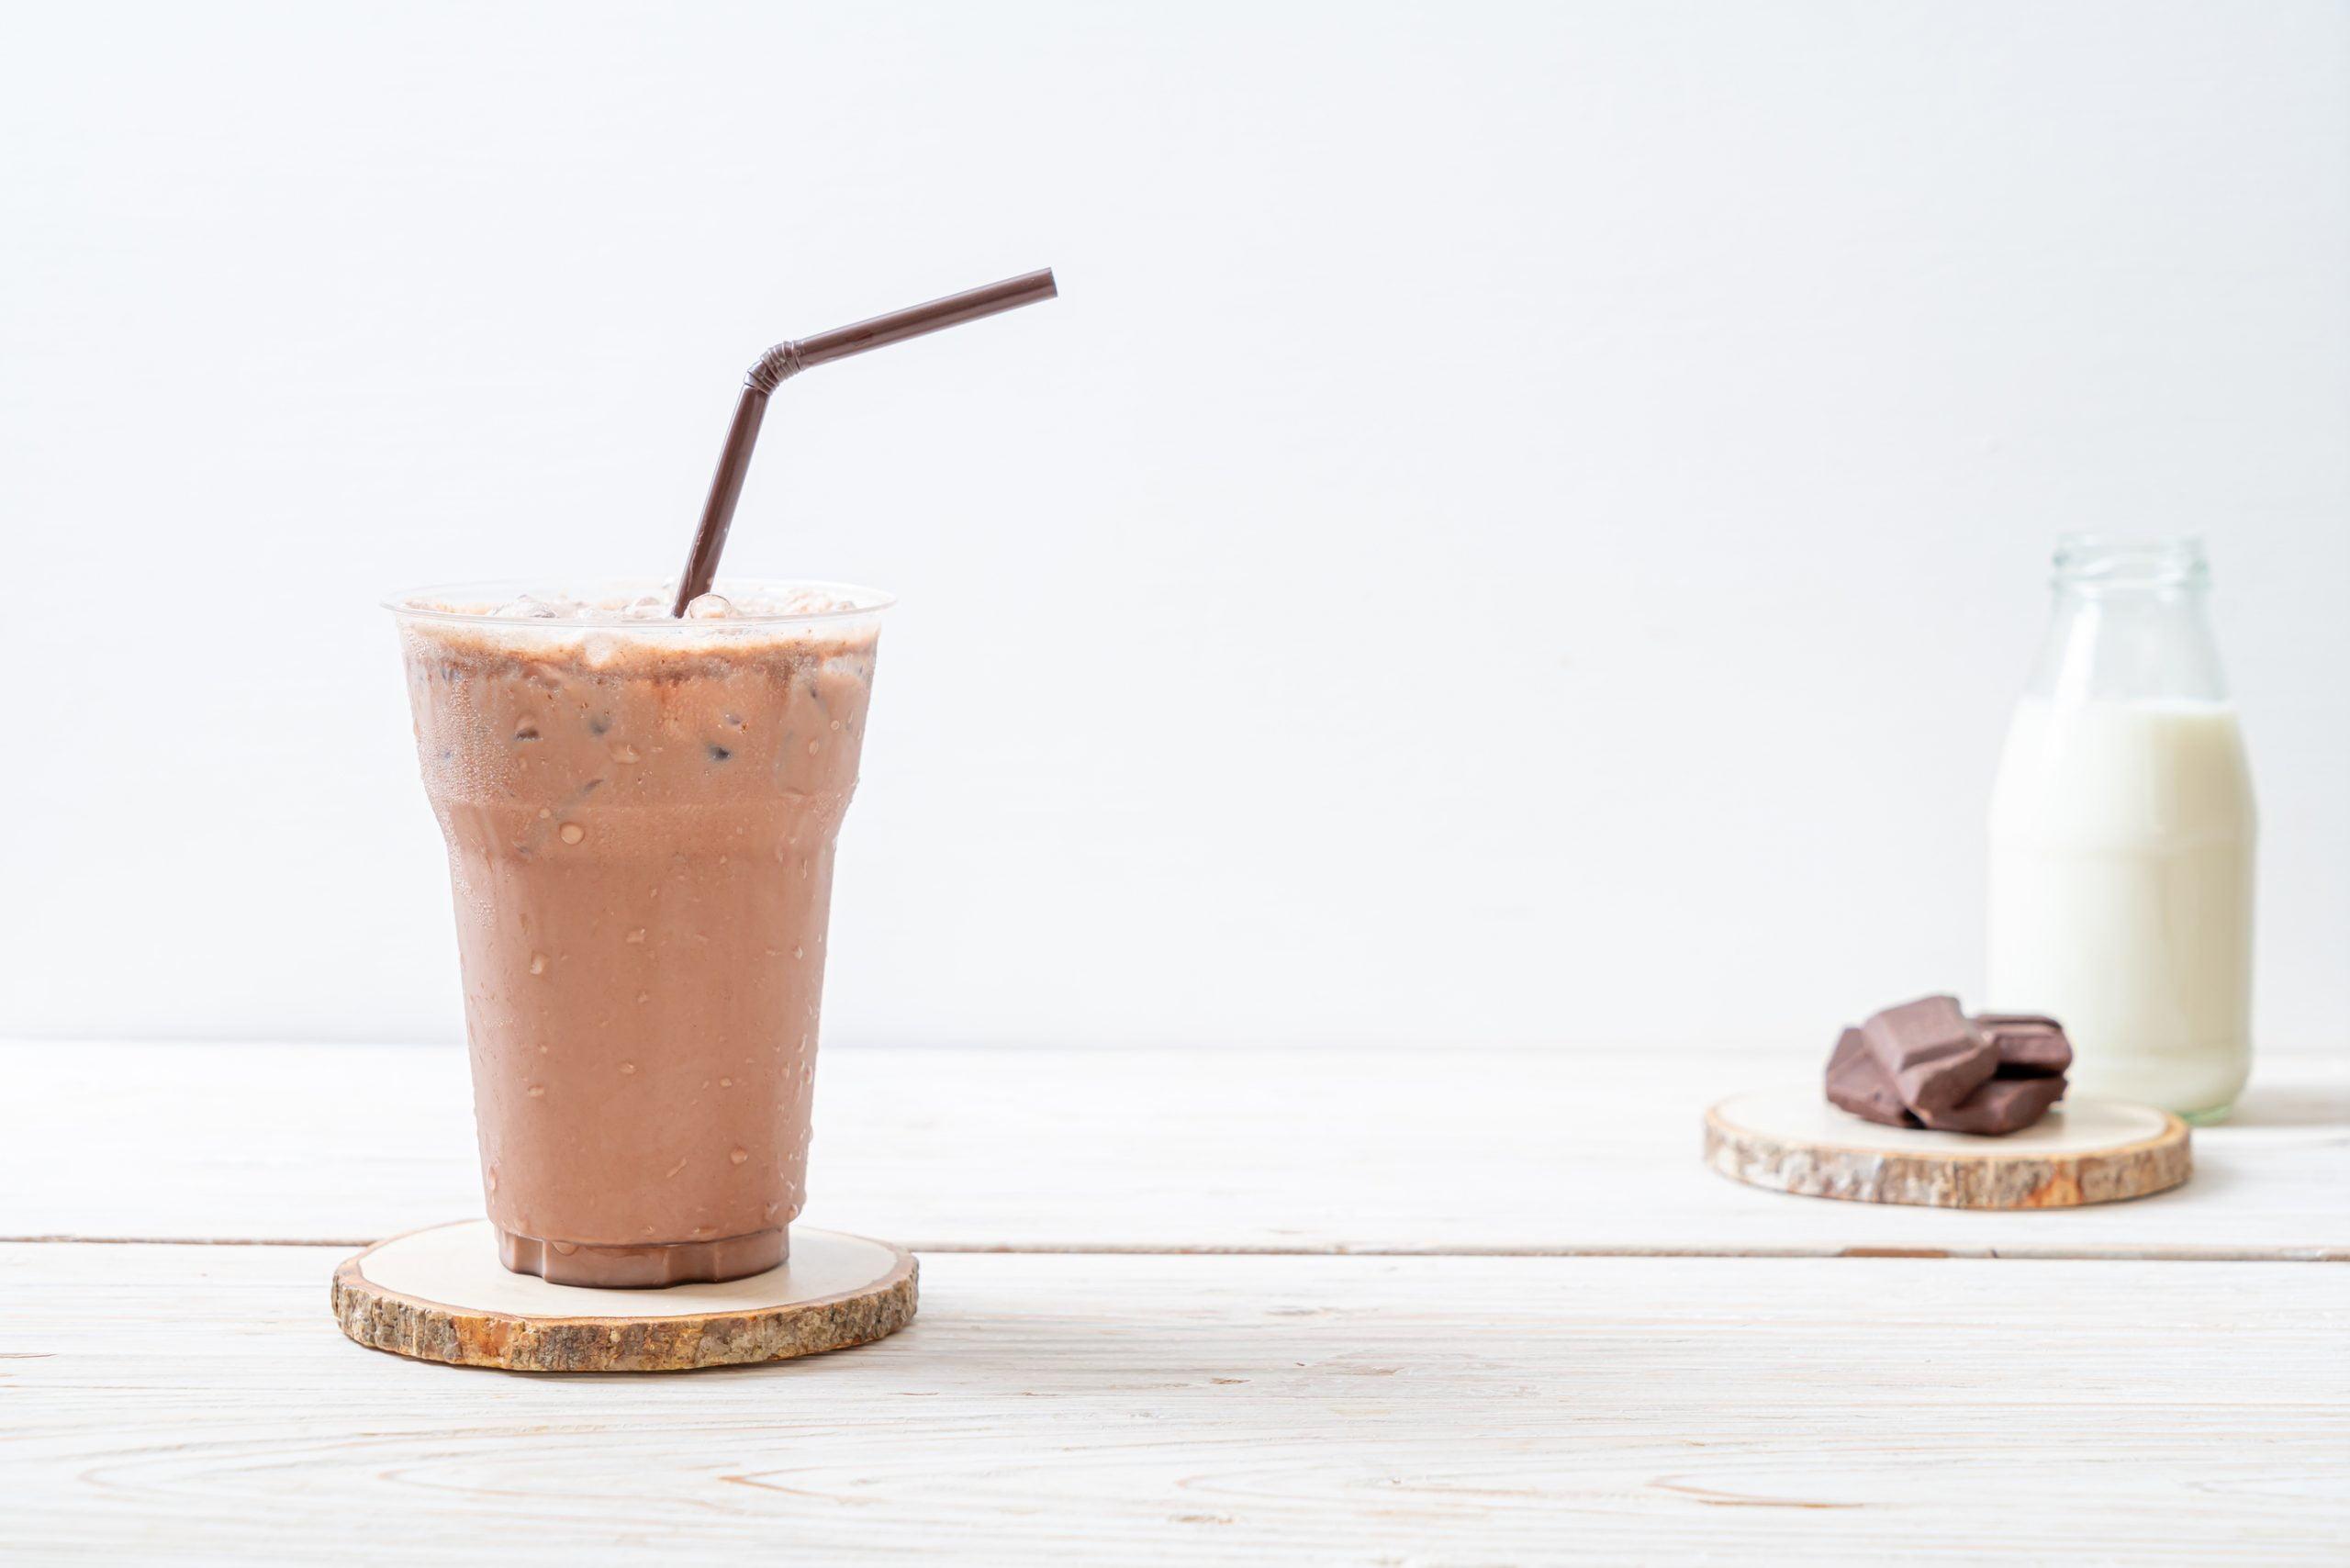 Frozen hot chcolate lifestyle image